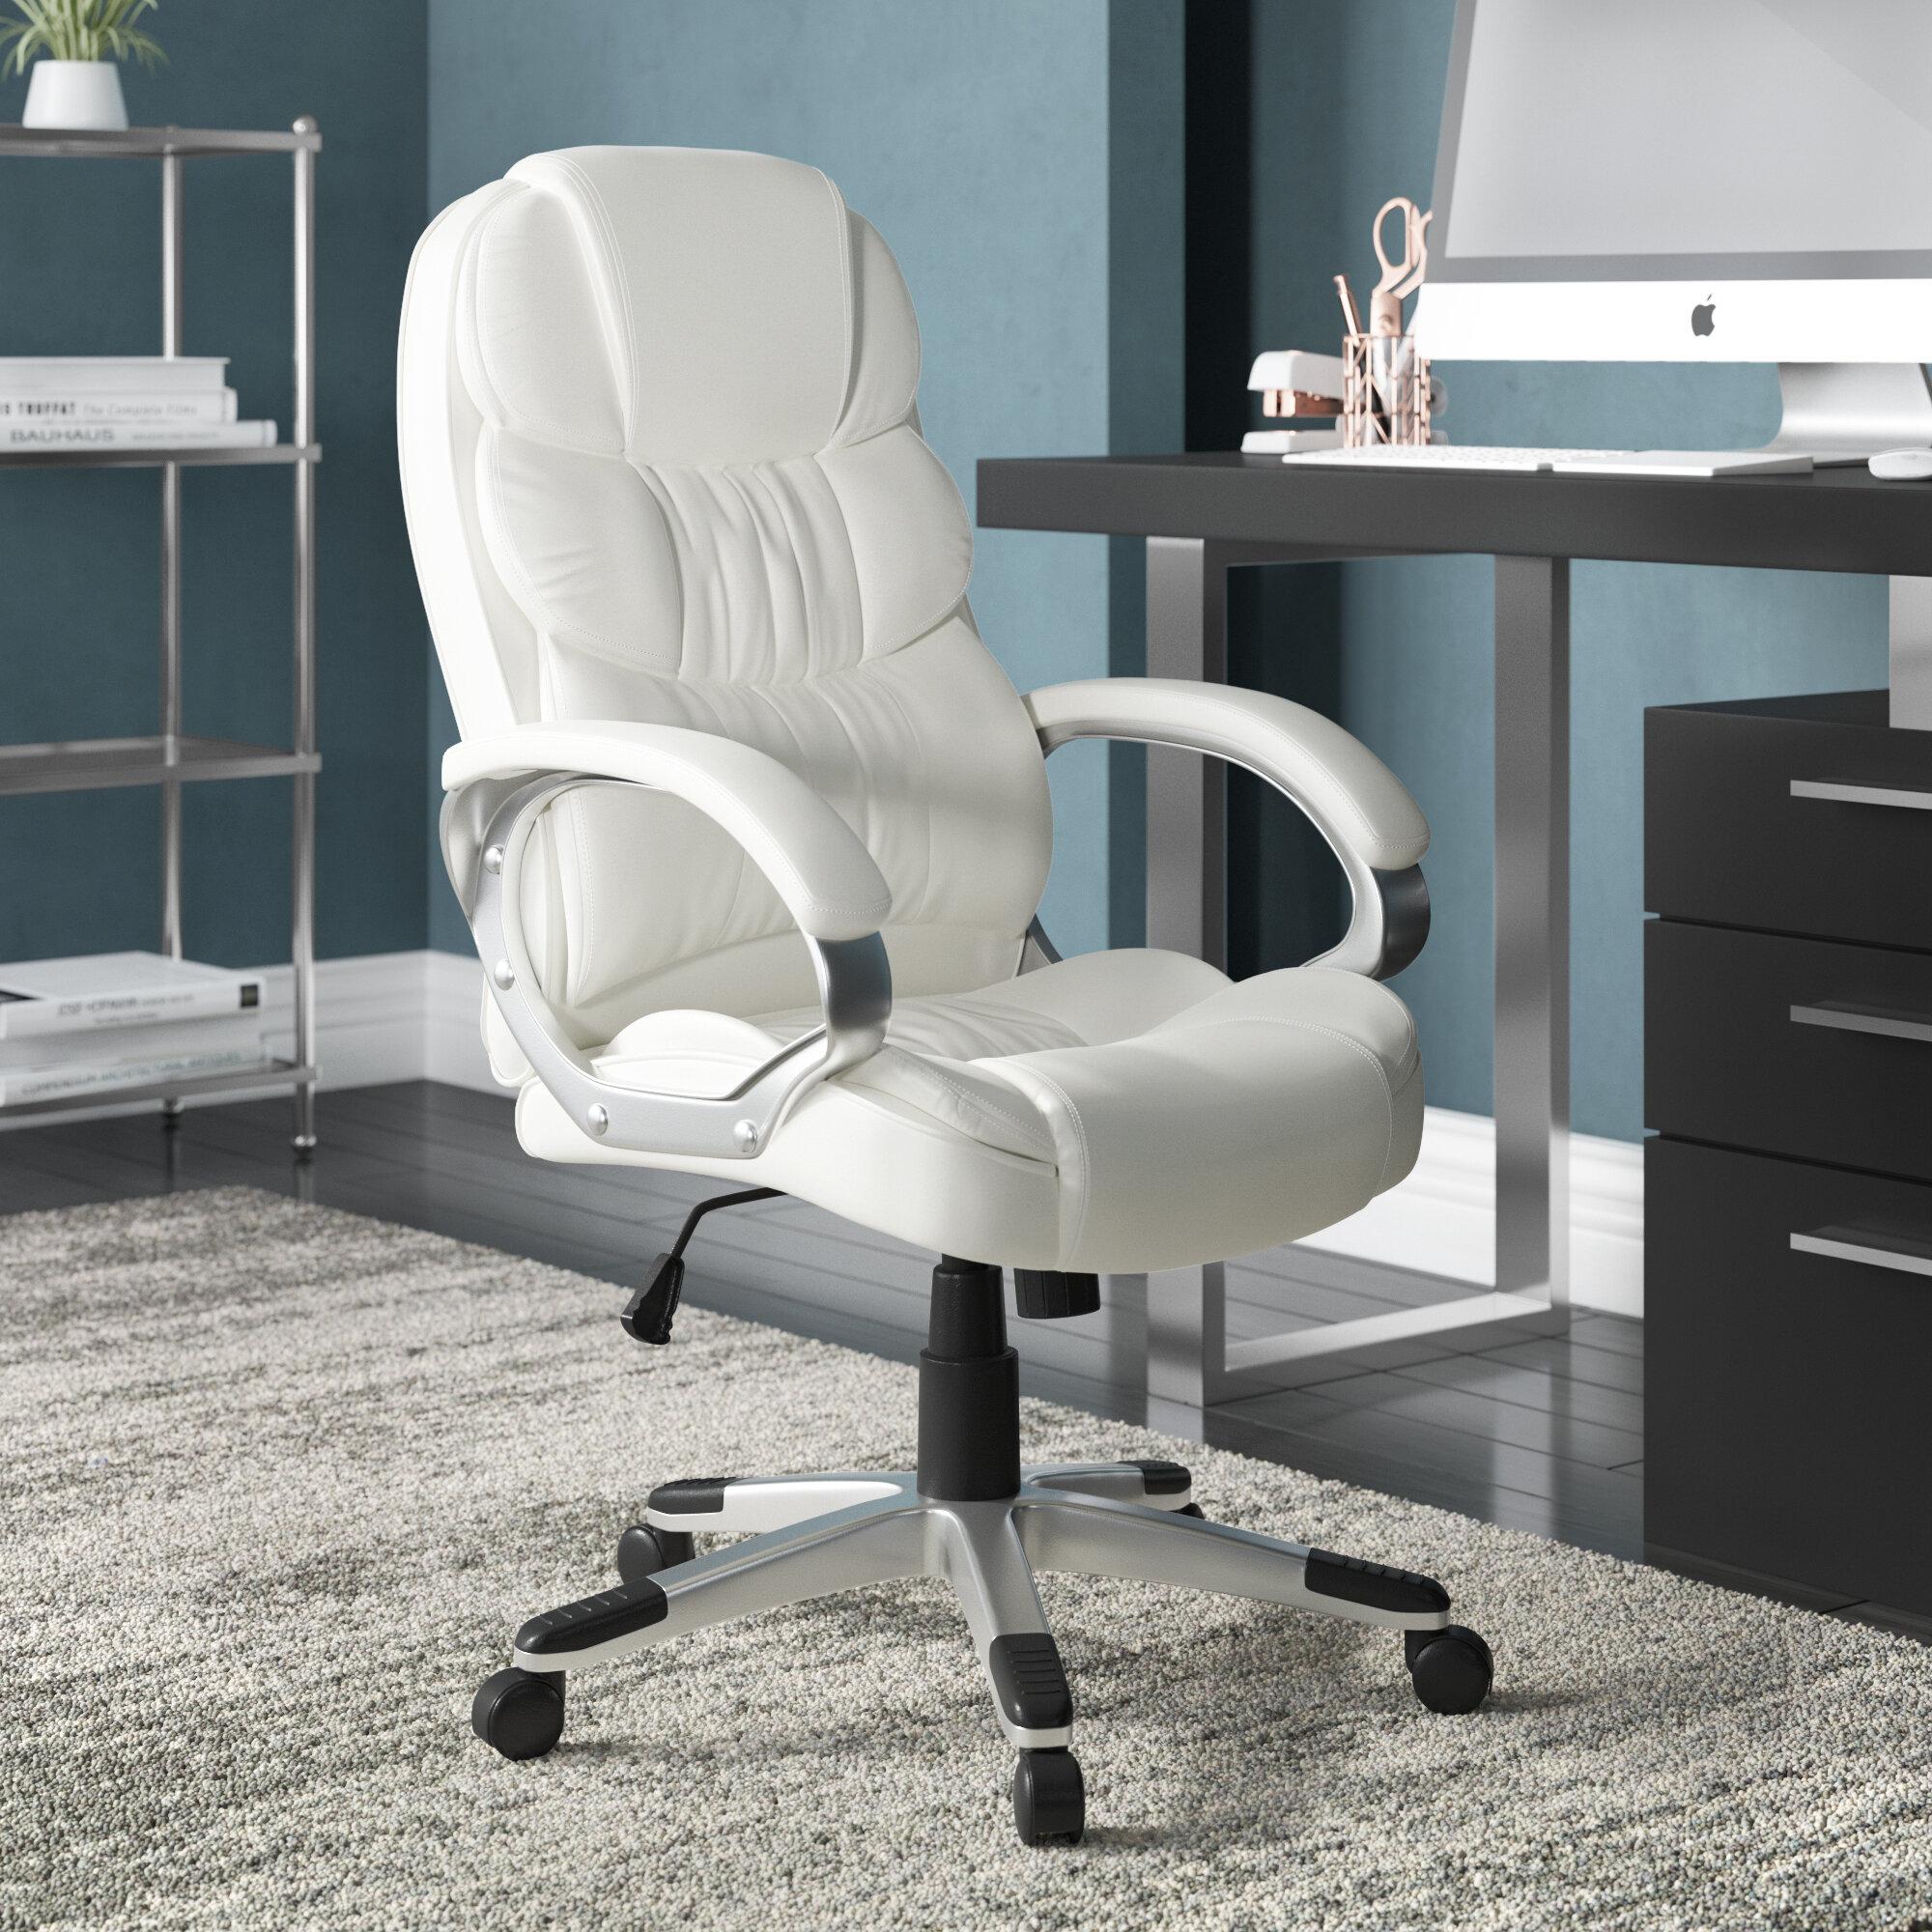 200lbs 300lbs Capacity Office Chairs You Ll Love In 2020 Wayfair